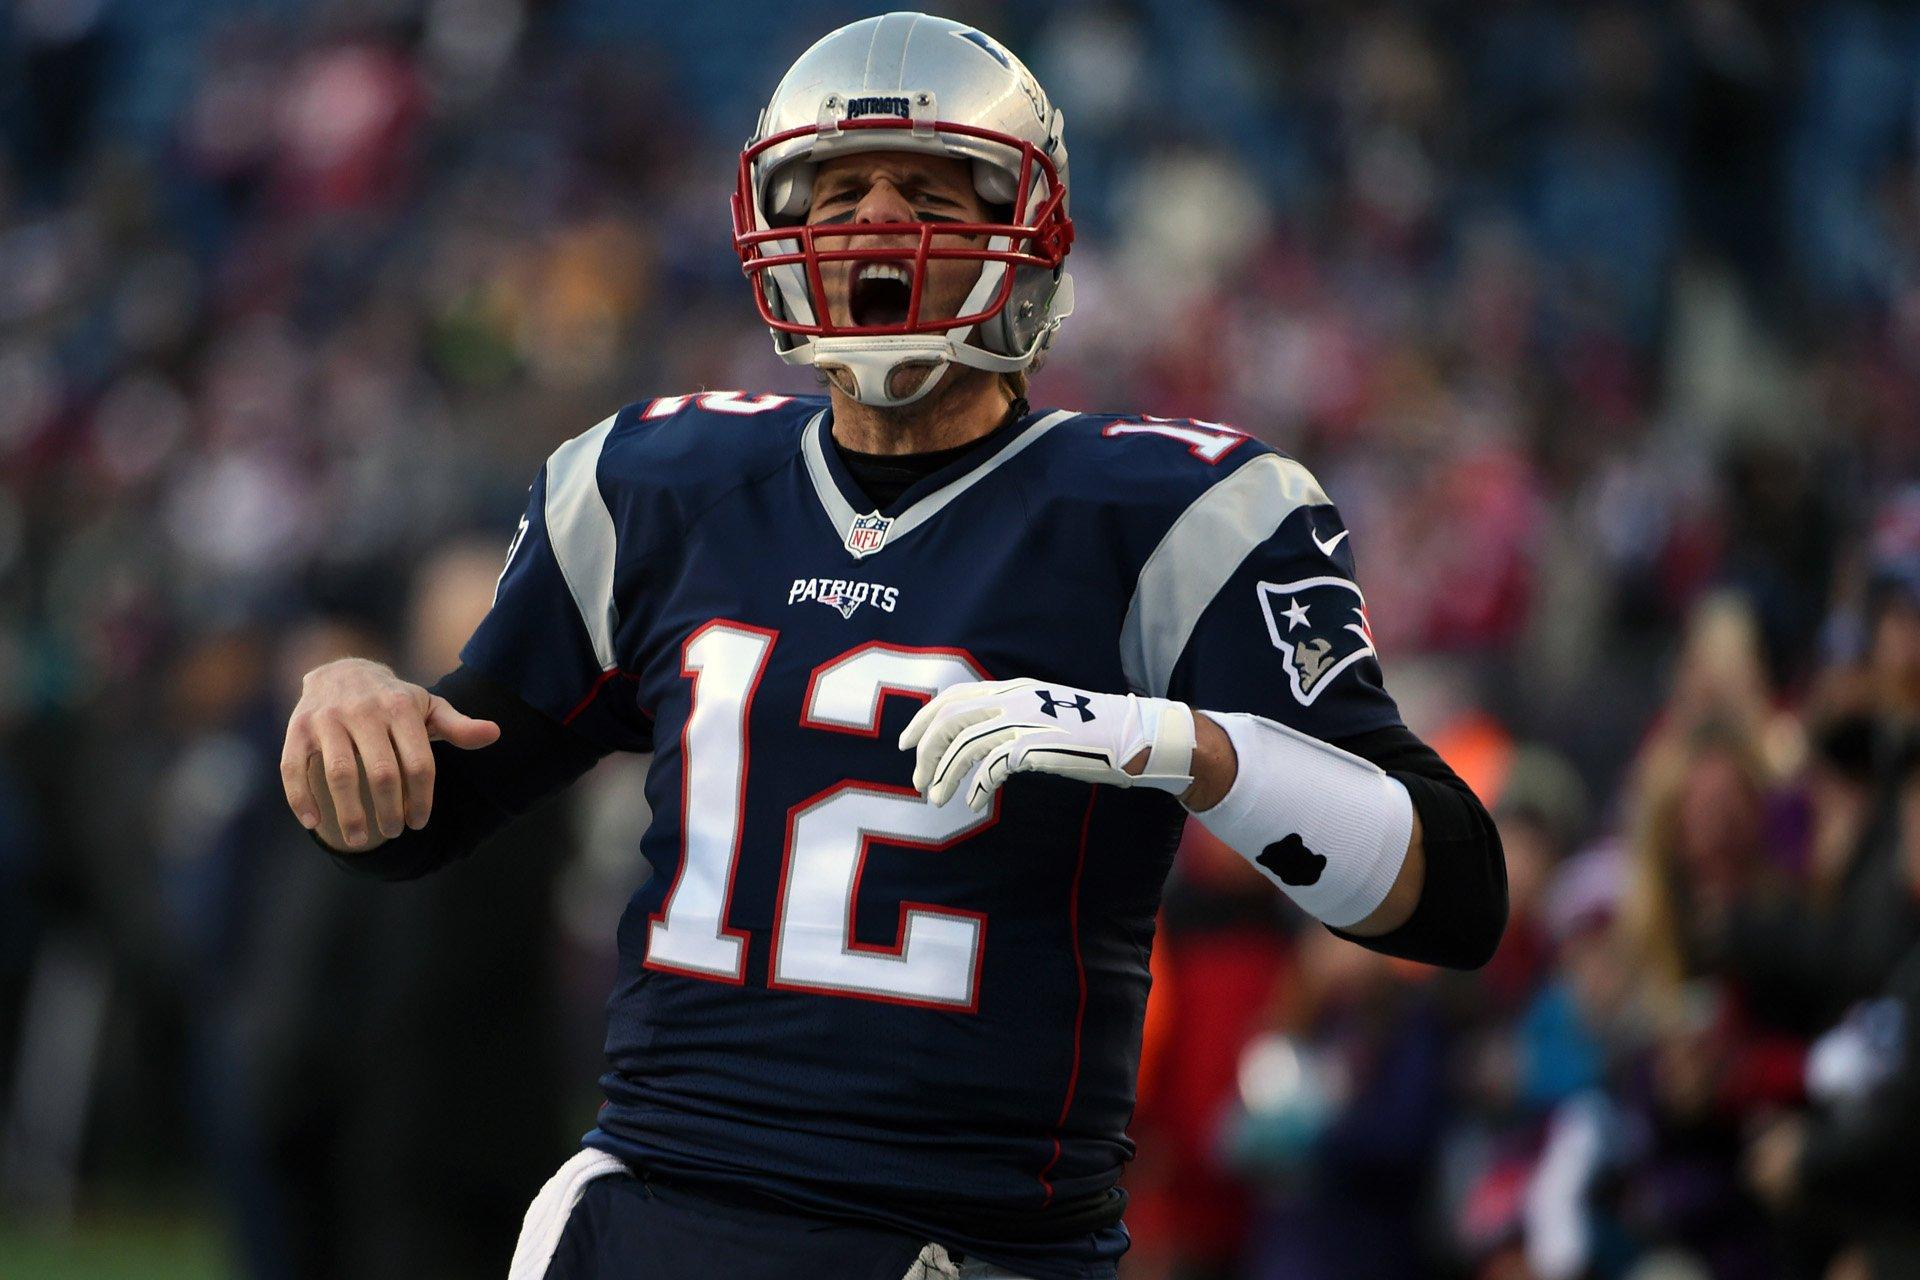 New England Patriots' Tom Brady HD Wallpaper | Background ...